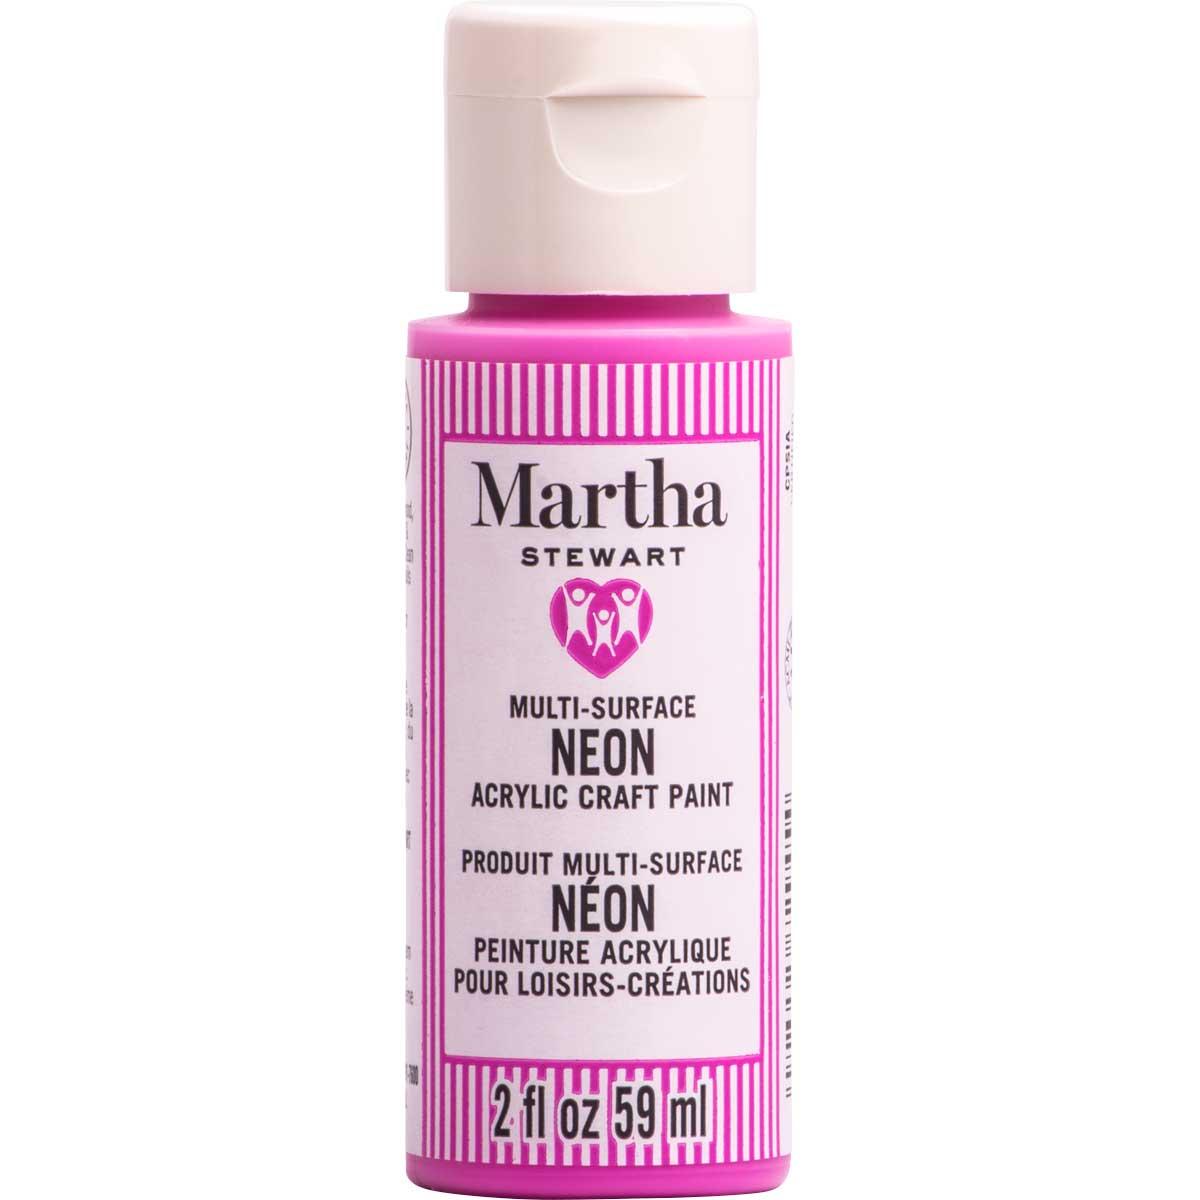 Martha Stewart® 2oz Multi-Surface Neon Acrylic Craft Paint - Magenta